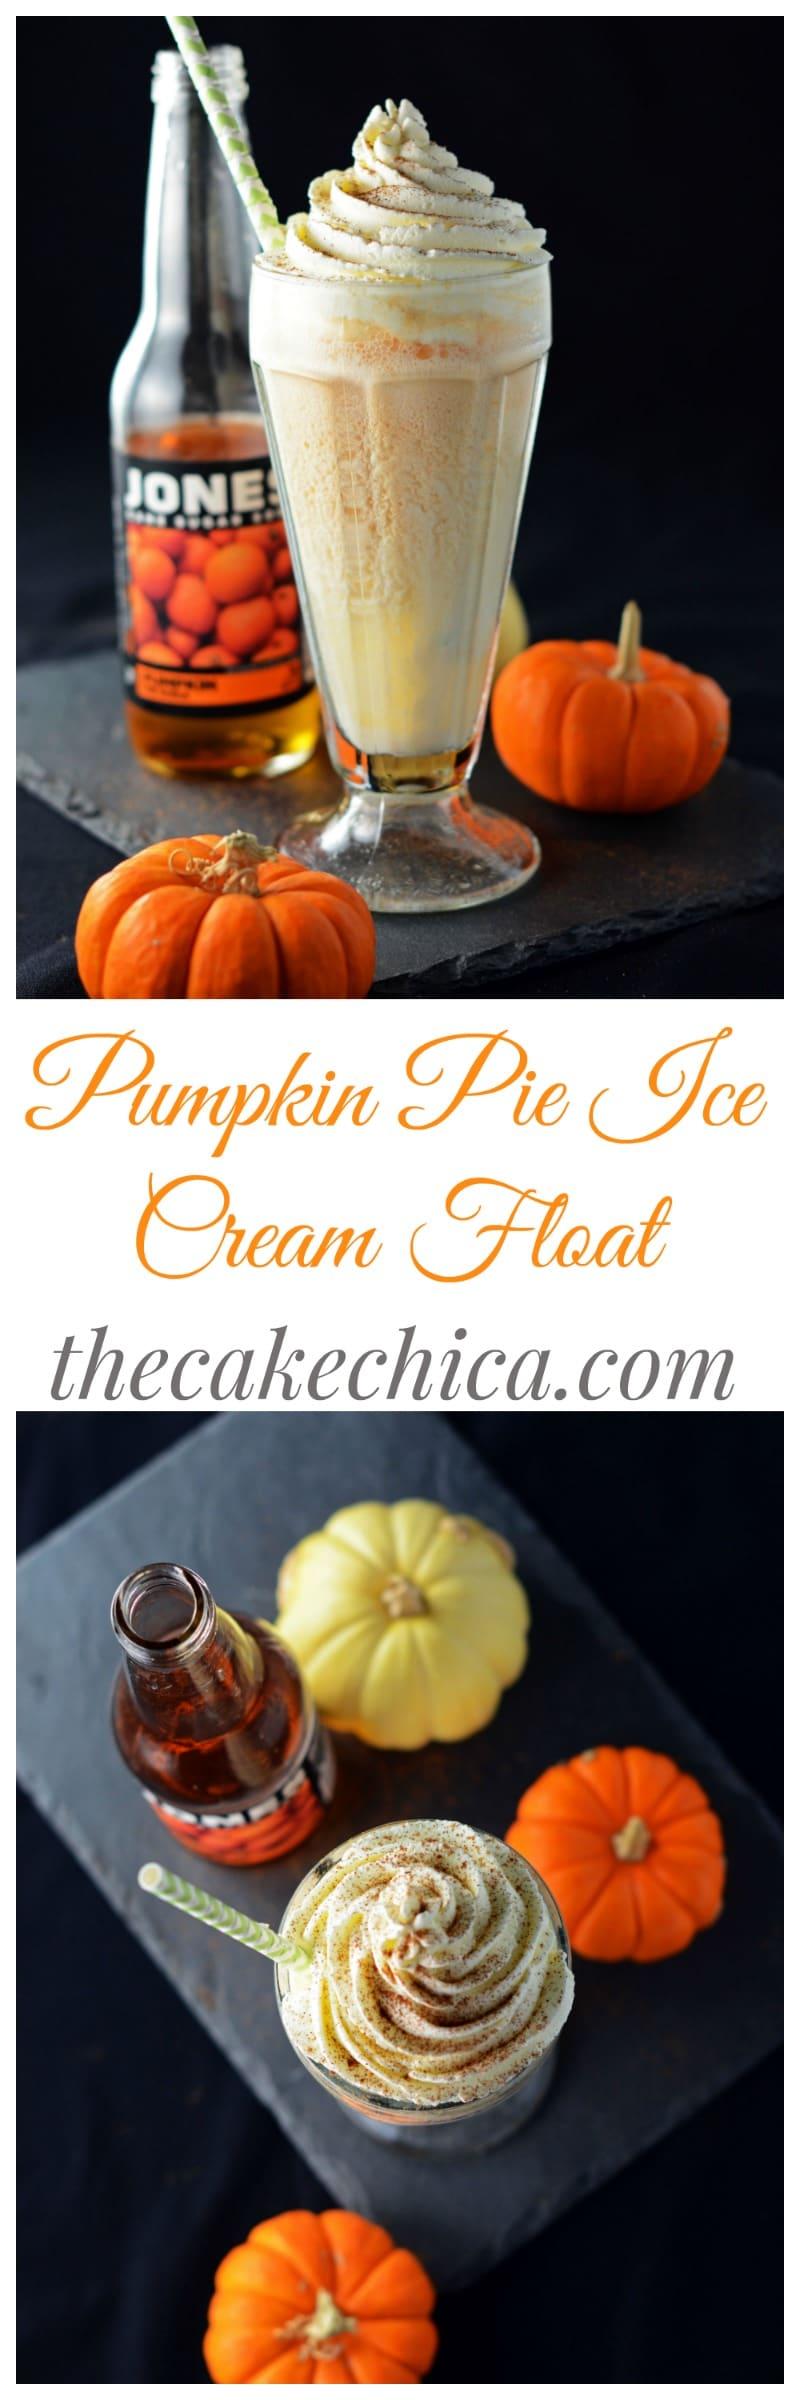 Pumpkin Pie Ice Cream Float